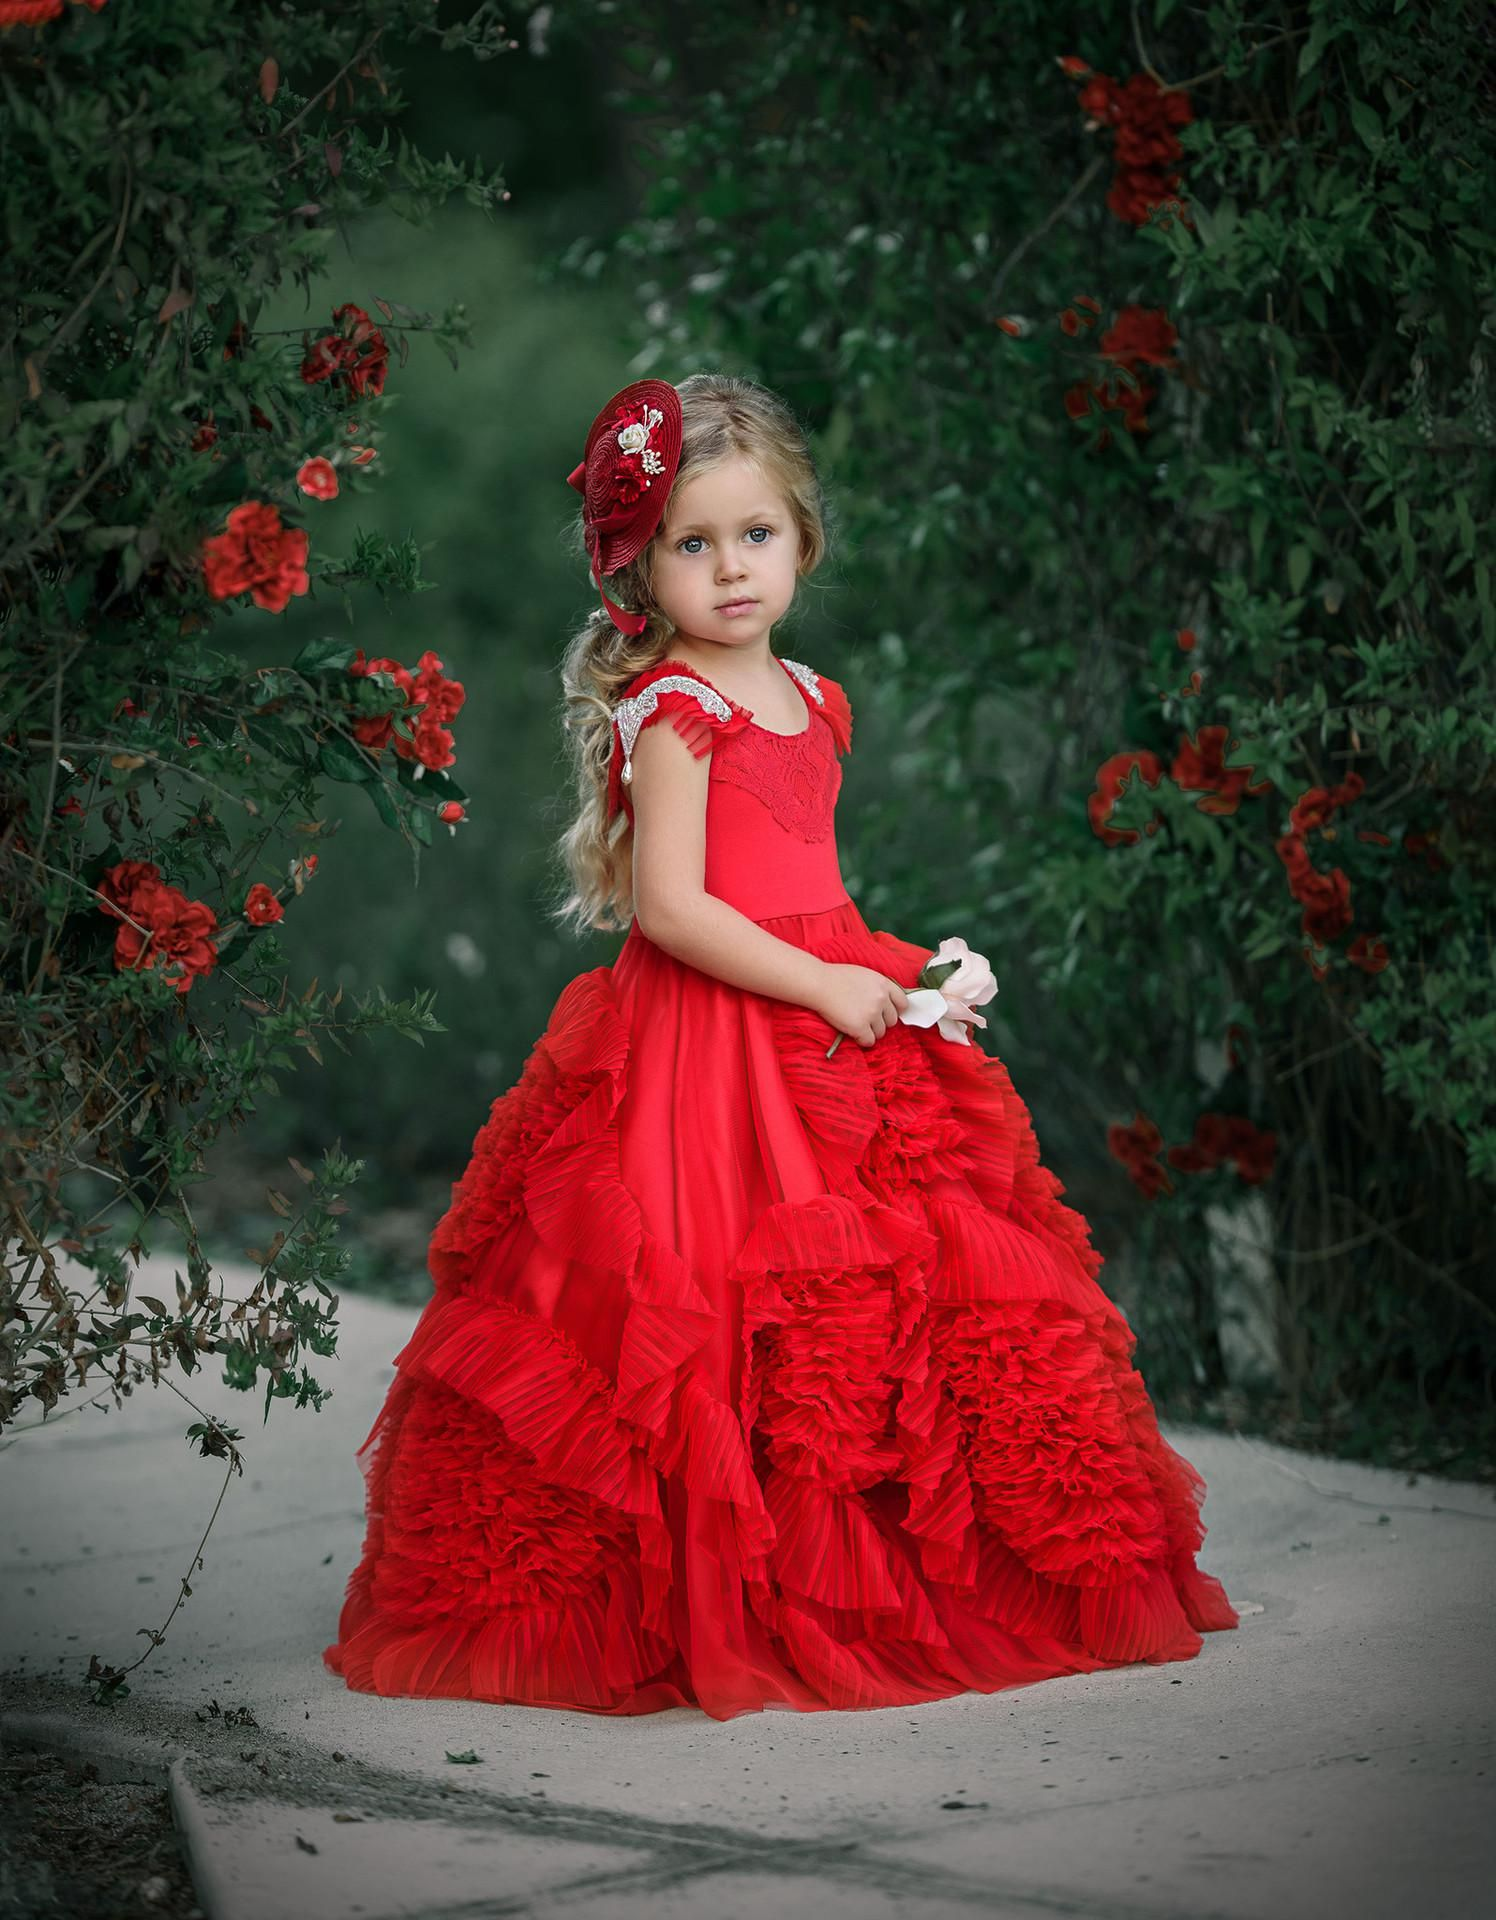 New Children Fashion Flower Red Dress Birthday Party Piano Dance